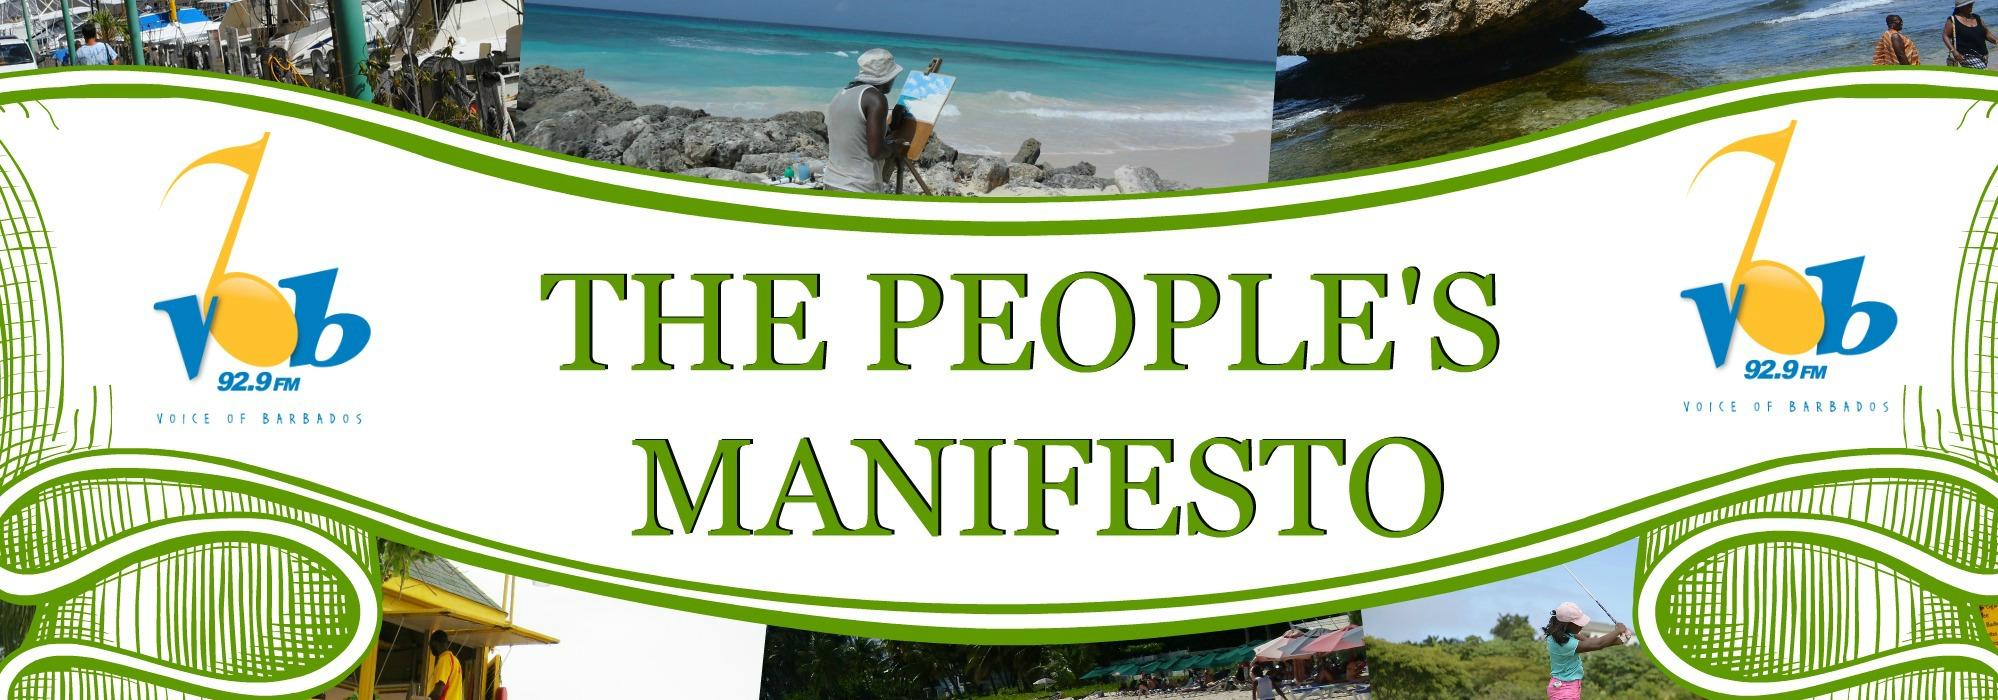 The People's Manifesto 700